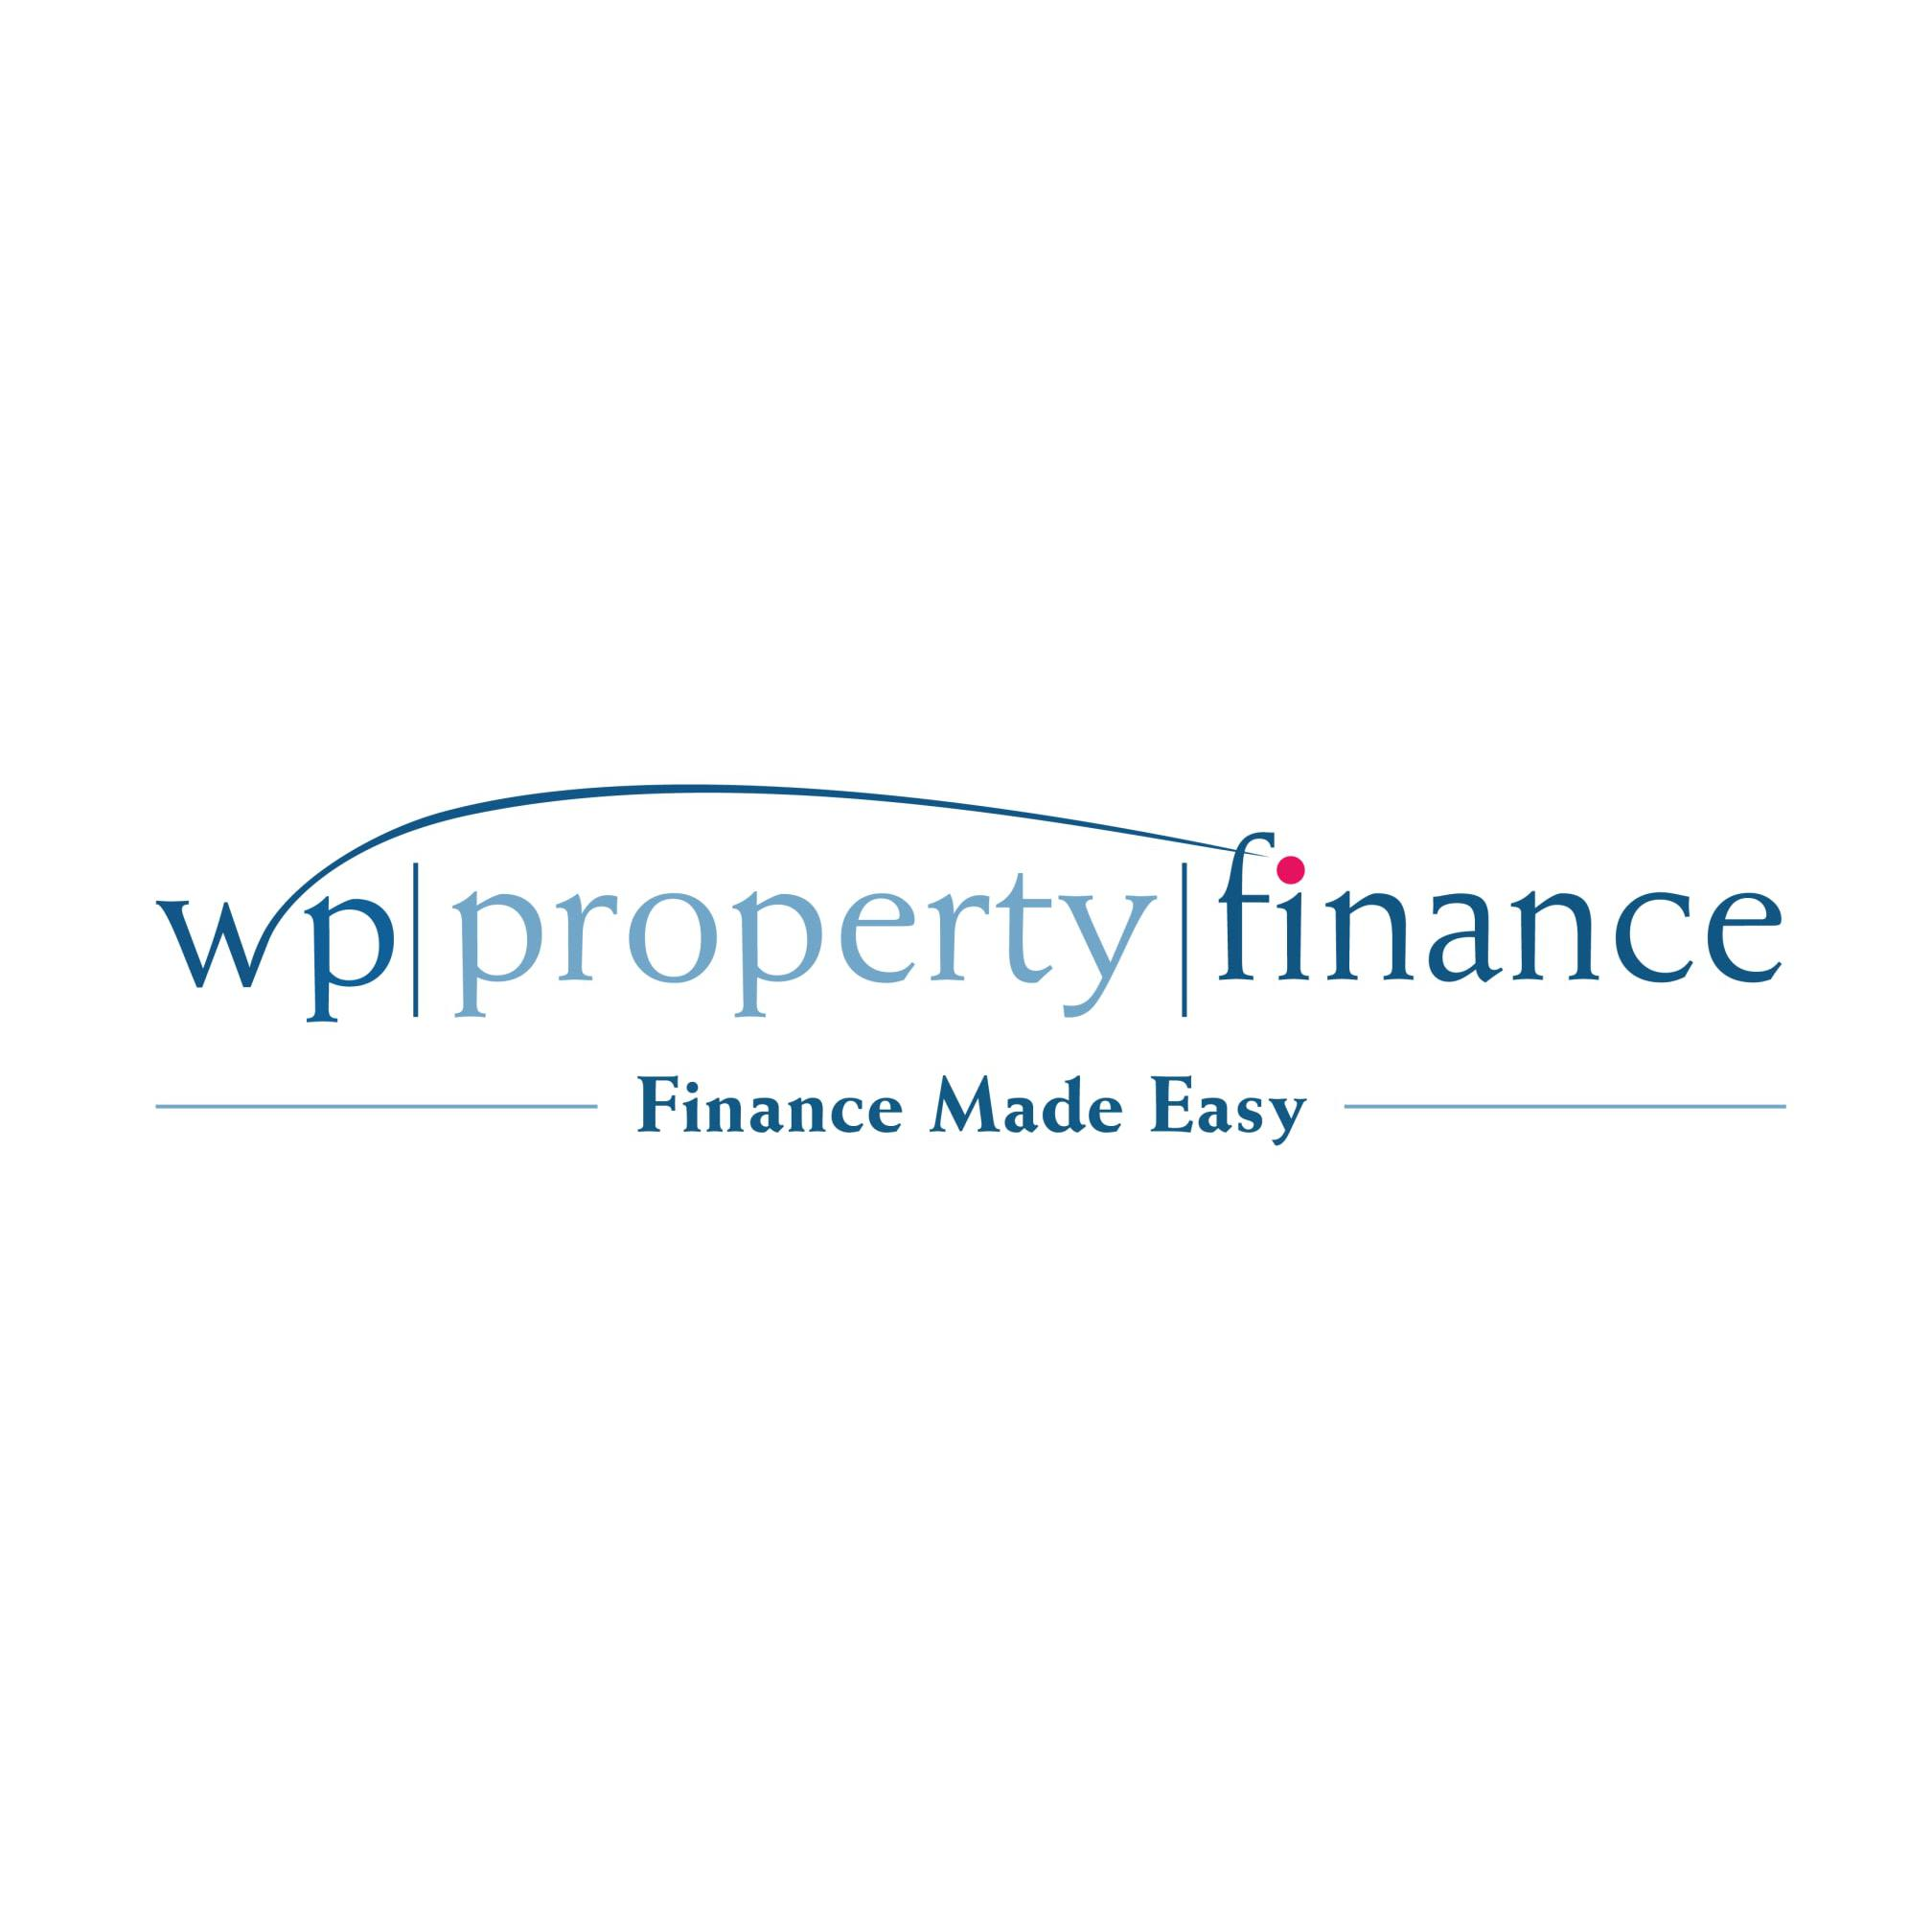 W P Property Finance - Colchester, Essex CO5 9SE - 01206 586580 | ShowMeLocal.com